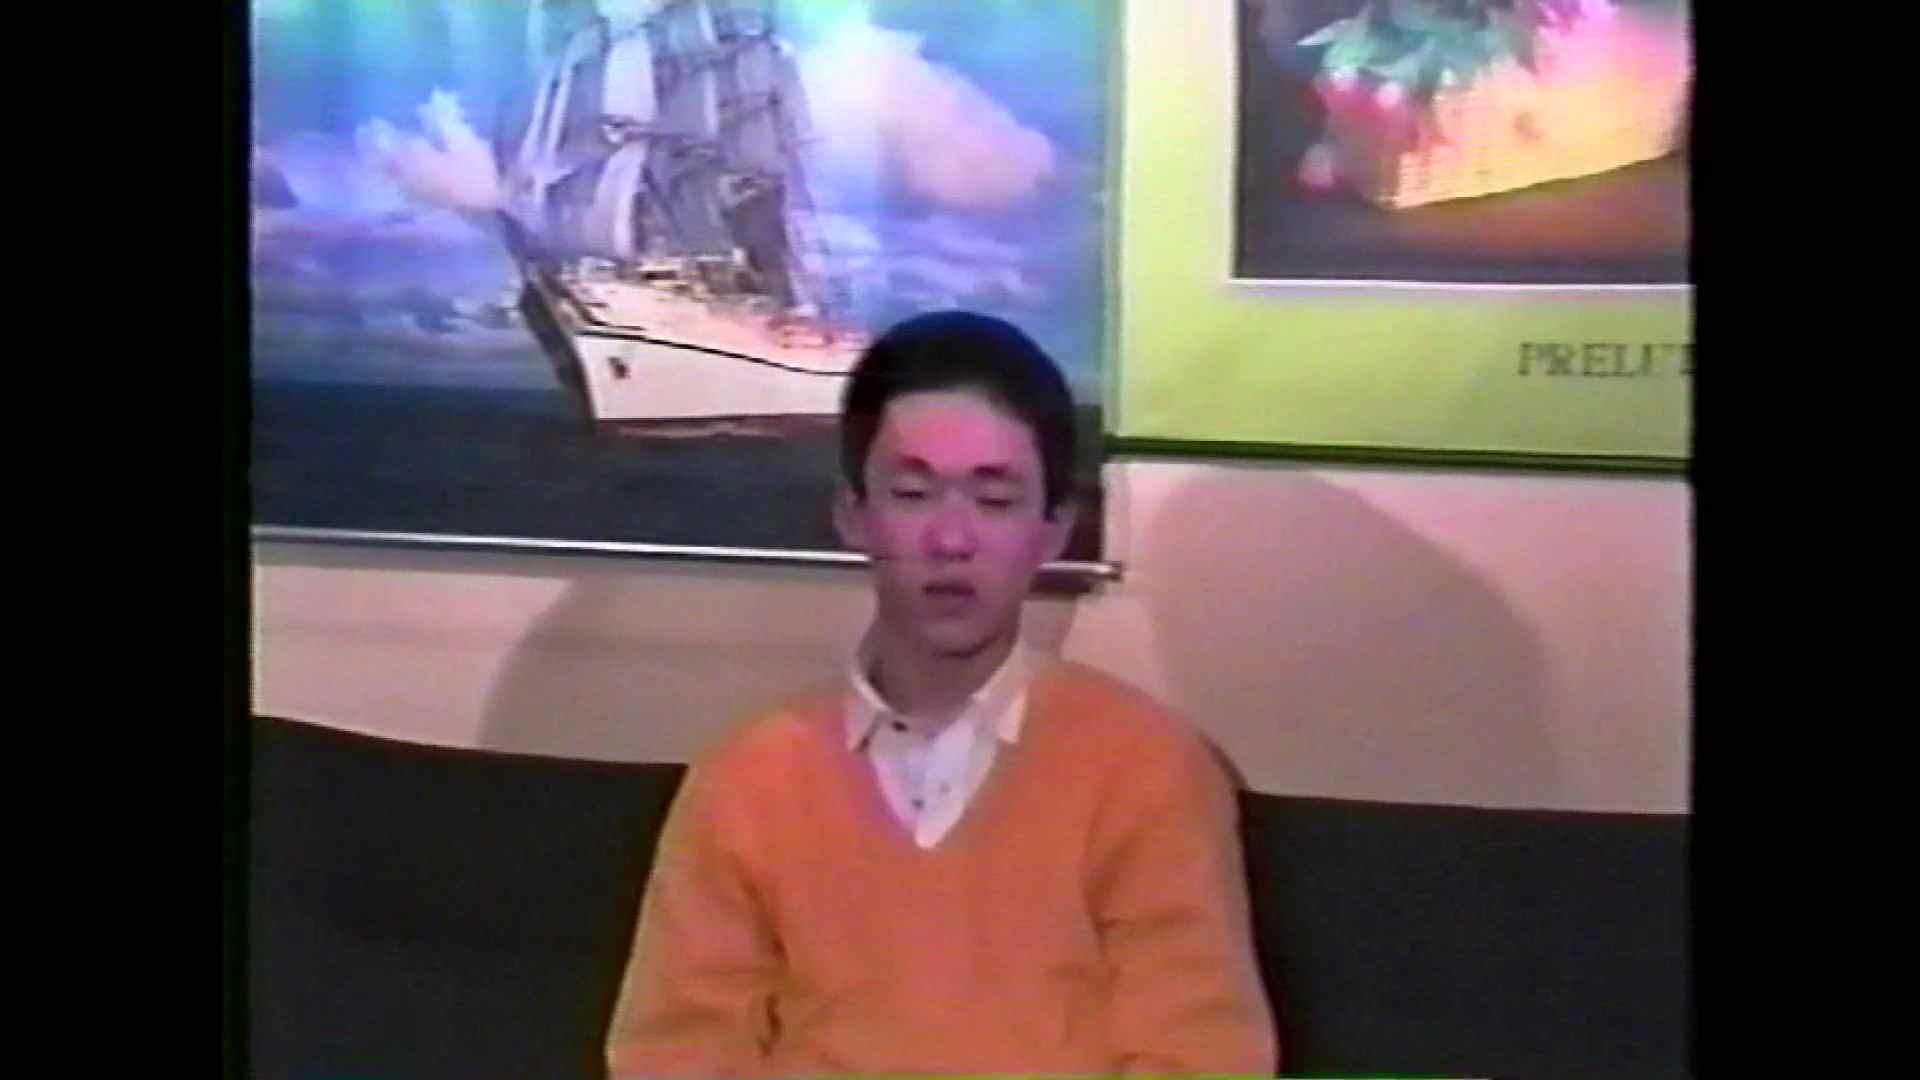 GAYBOY宏のオカズ倉庫Vol.2-1 ノンケ君達の・・ | GAY  68枚 1